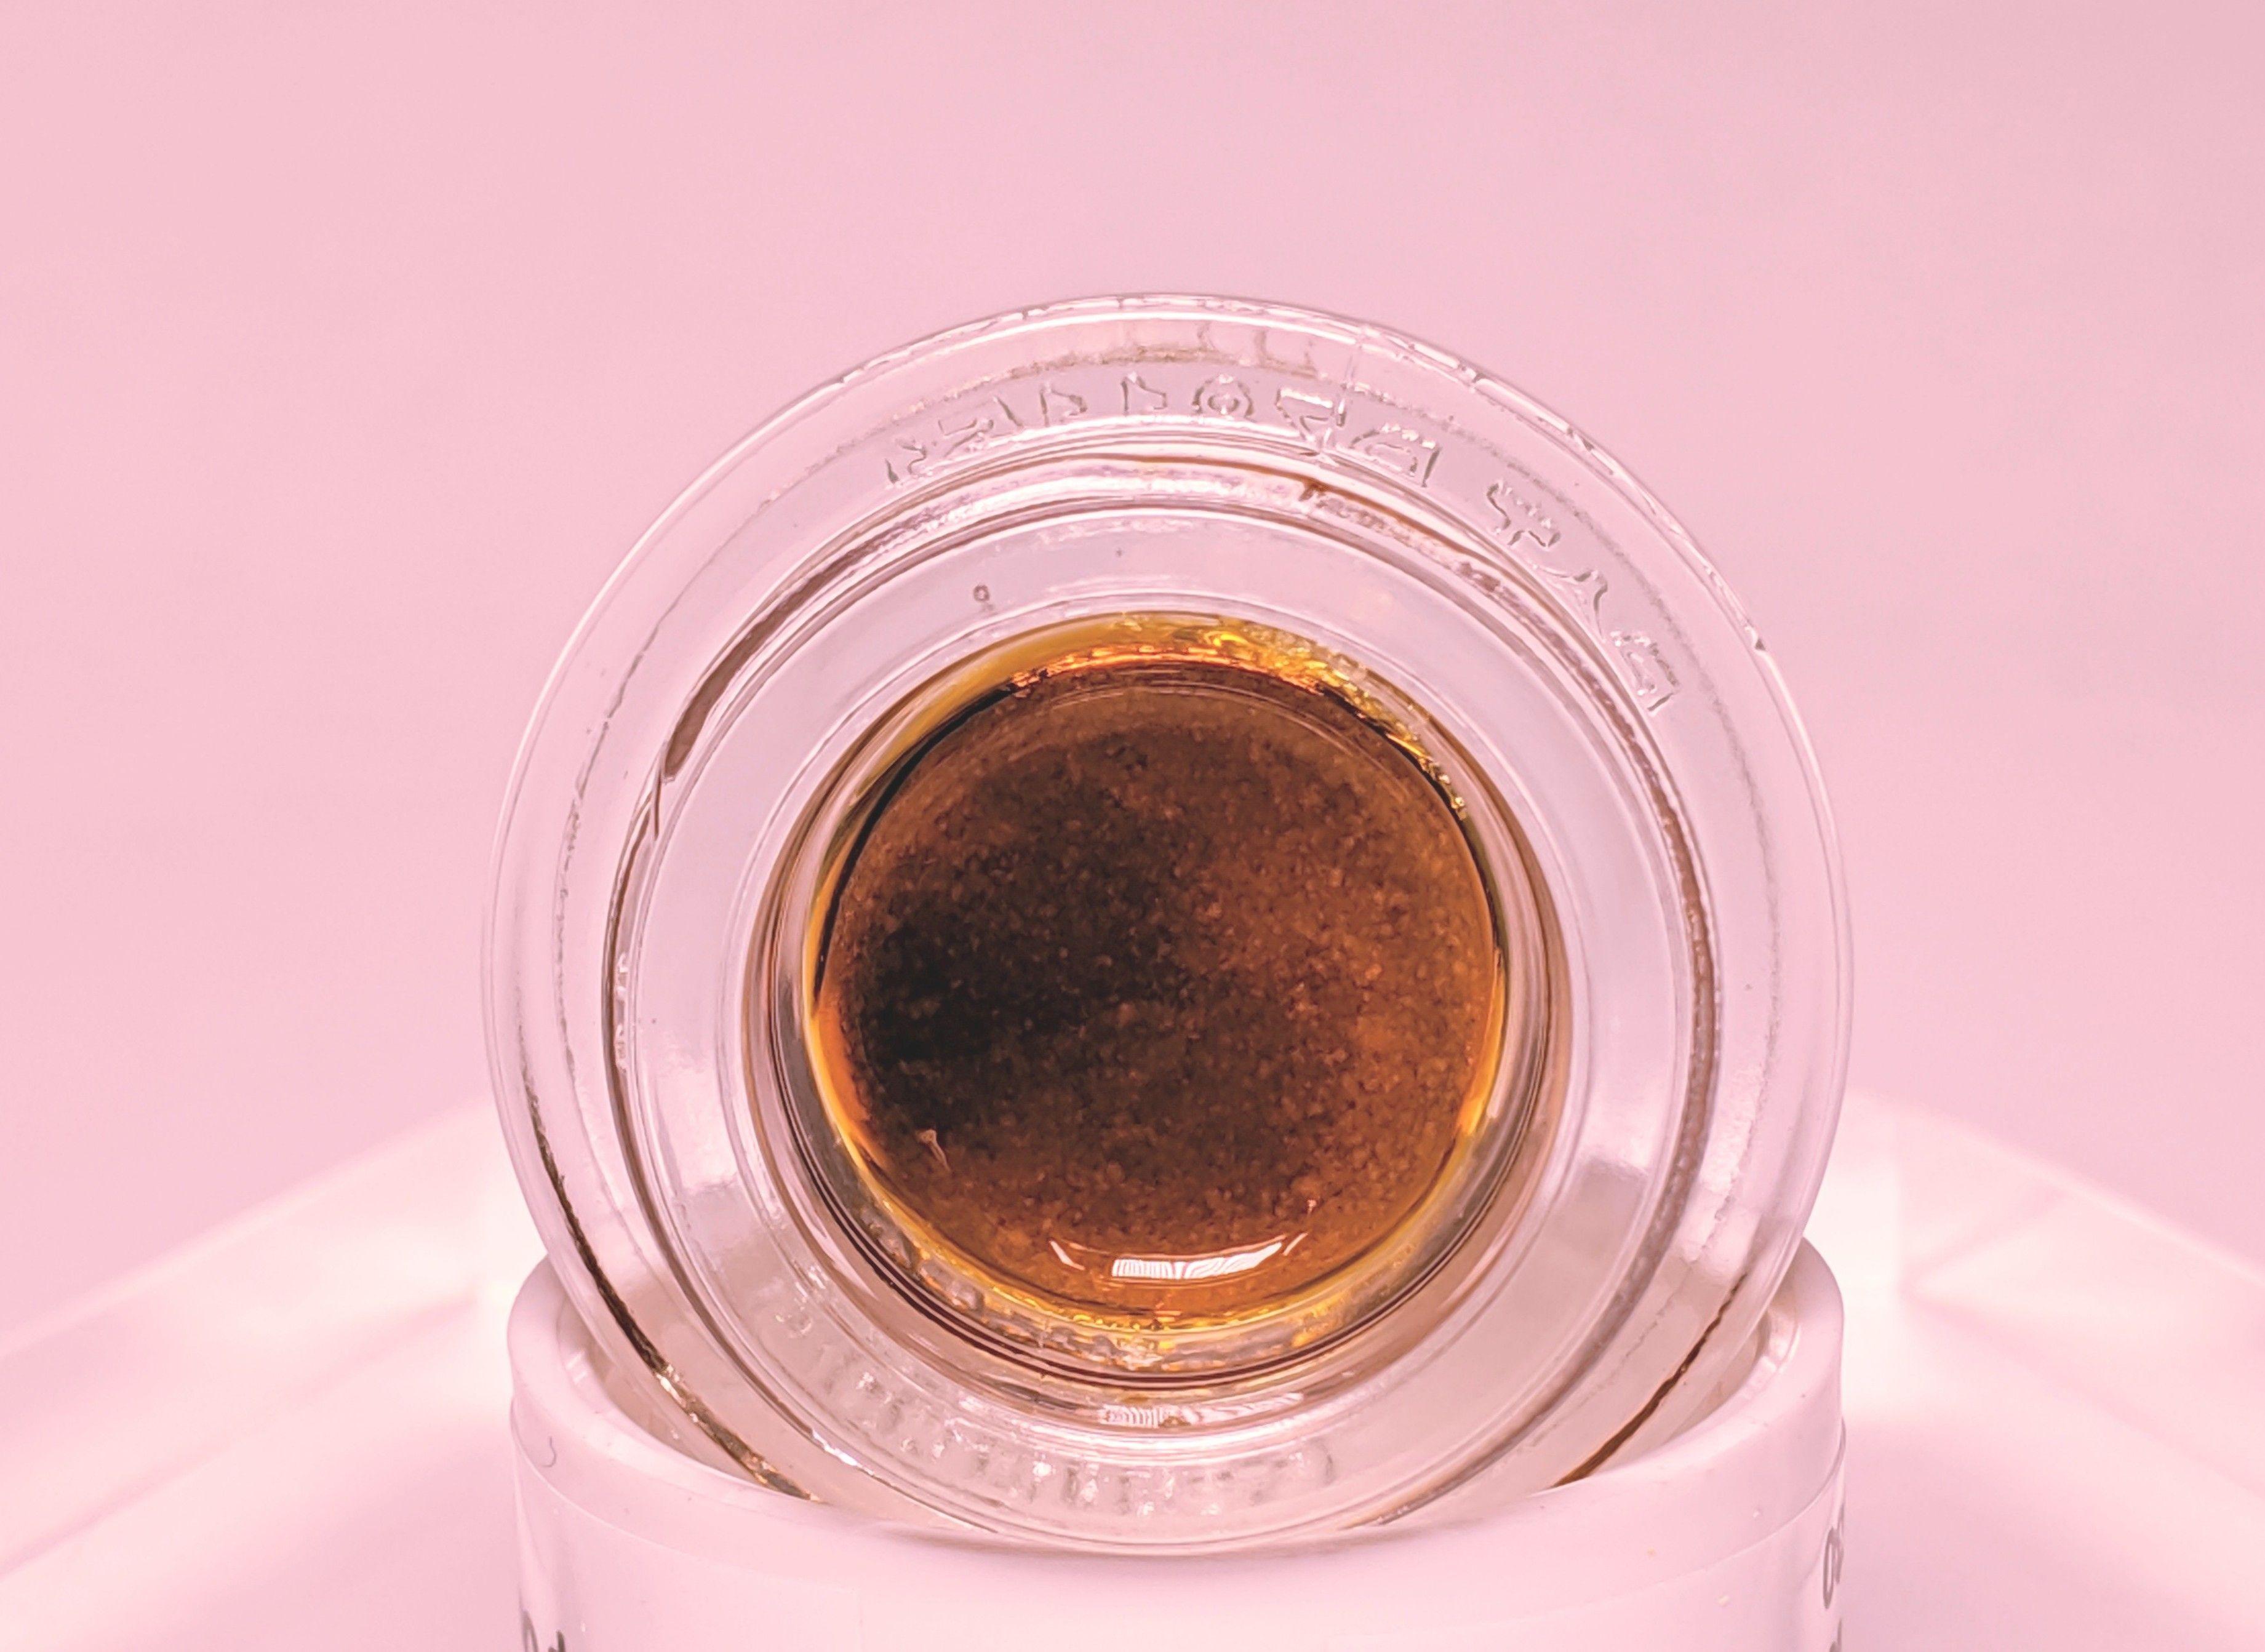 Bobsled - Hell's OG, Hybrid, Sugar Sauce